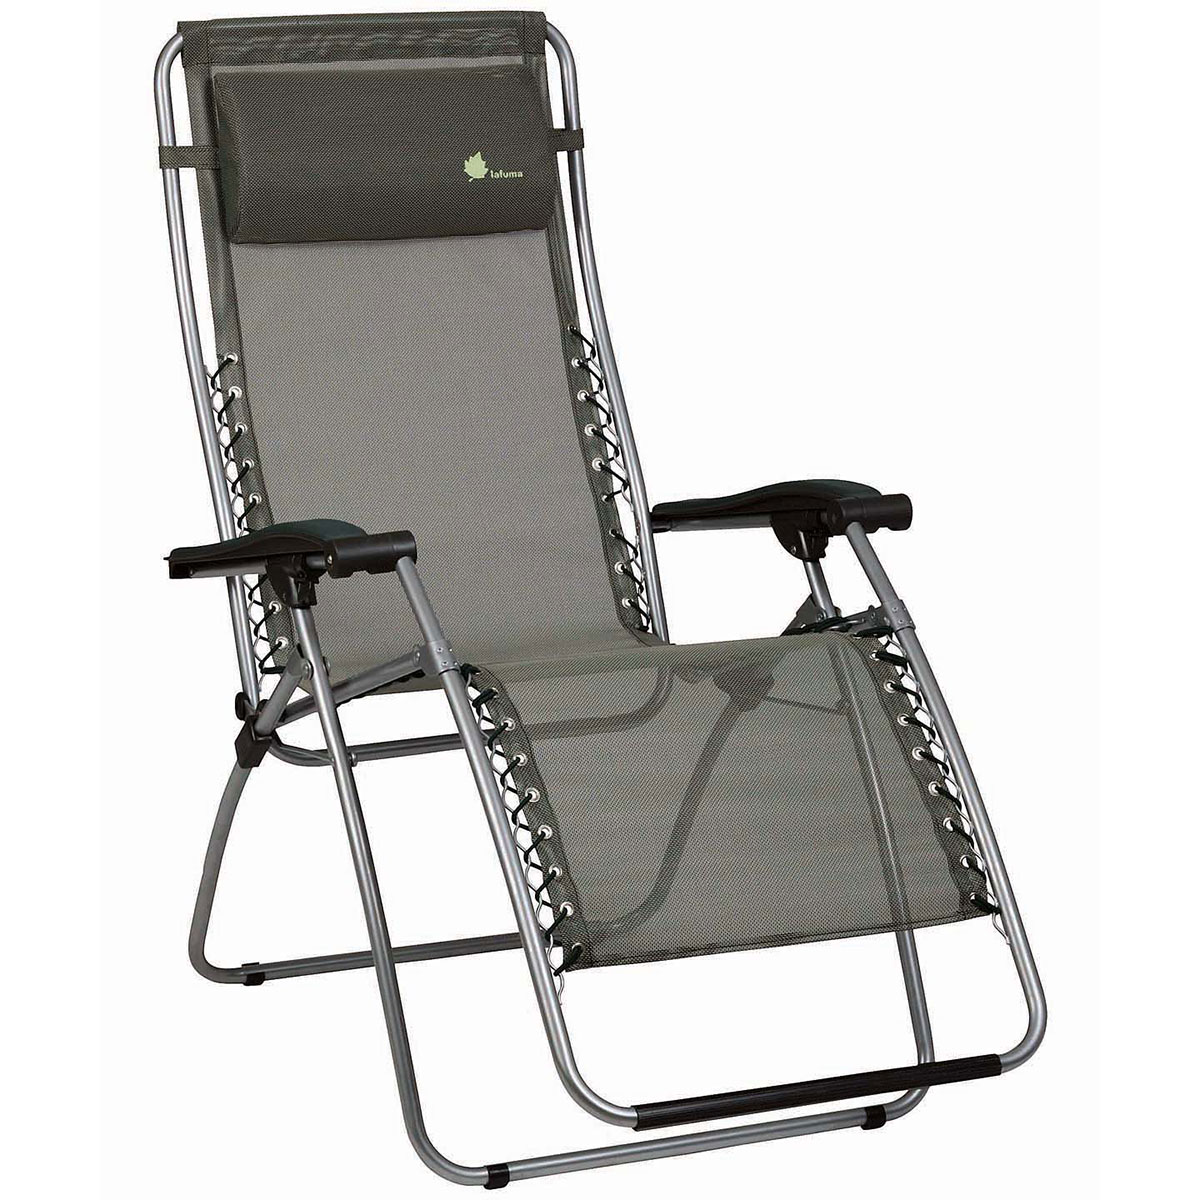 ergonomic patio lounge chairs photo - 2